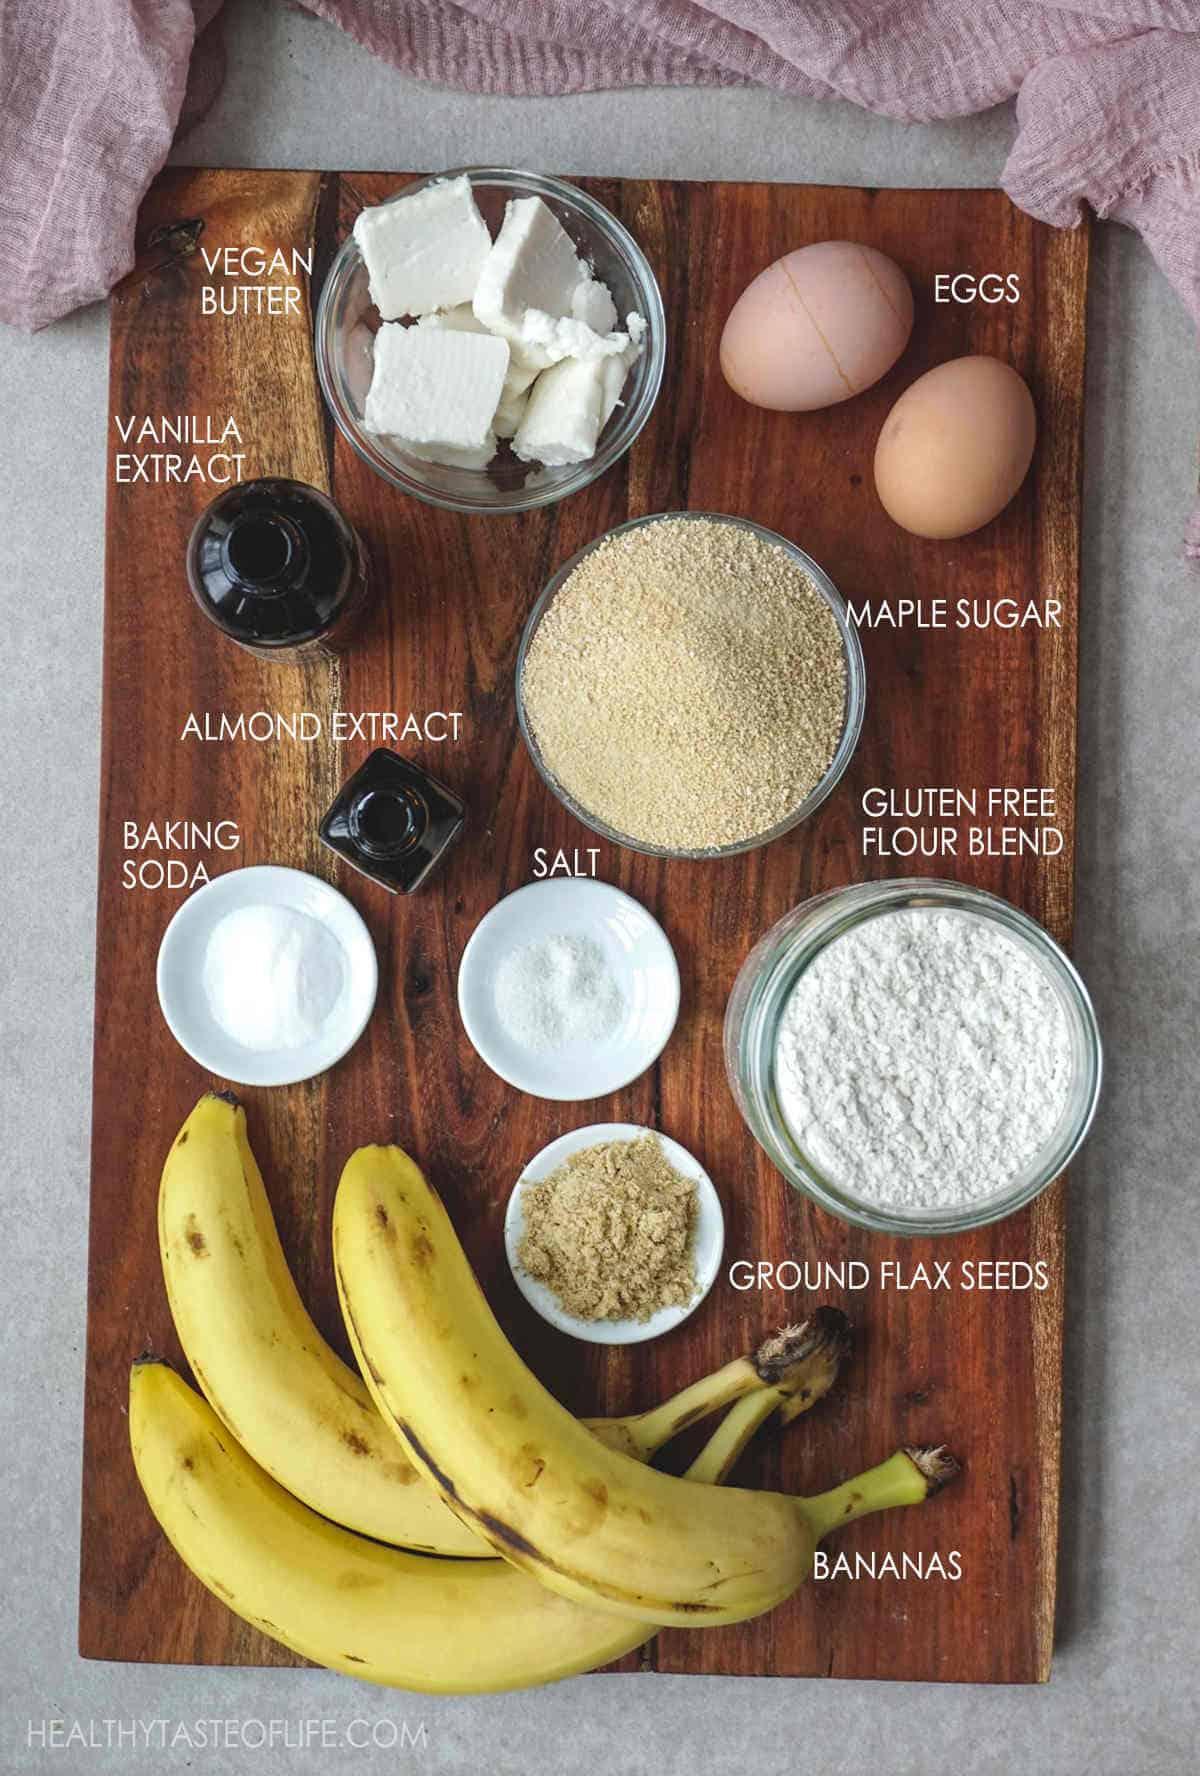 Ingredients for gluten free banana cake batter #bananacake #glutenfree